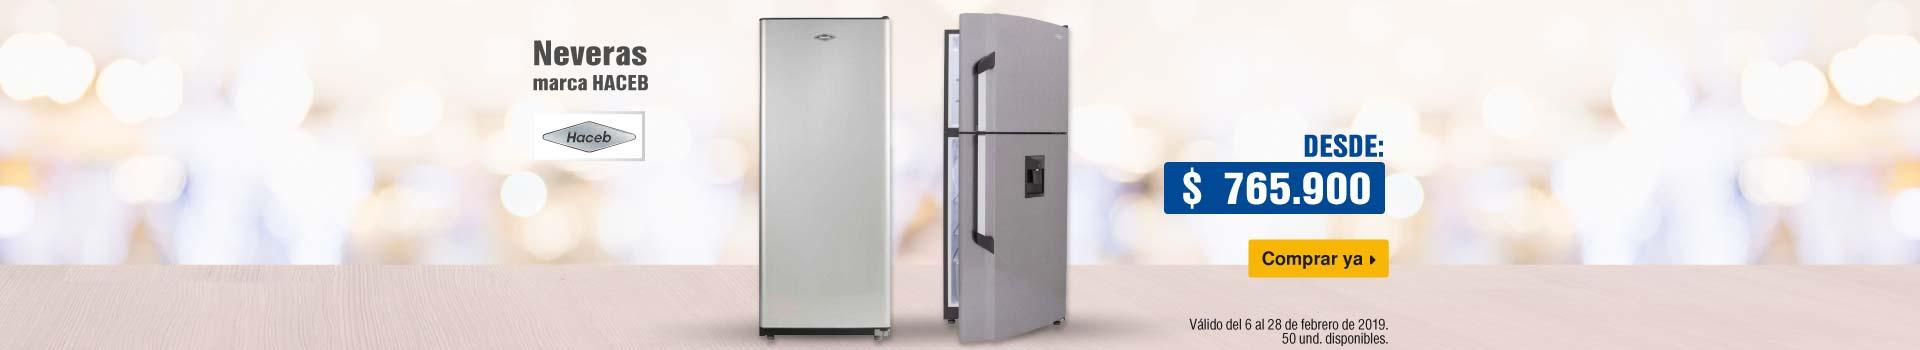 AK-KT-mayores-4-1-ELECT-BCAT-refrigeracion-050219